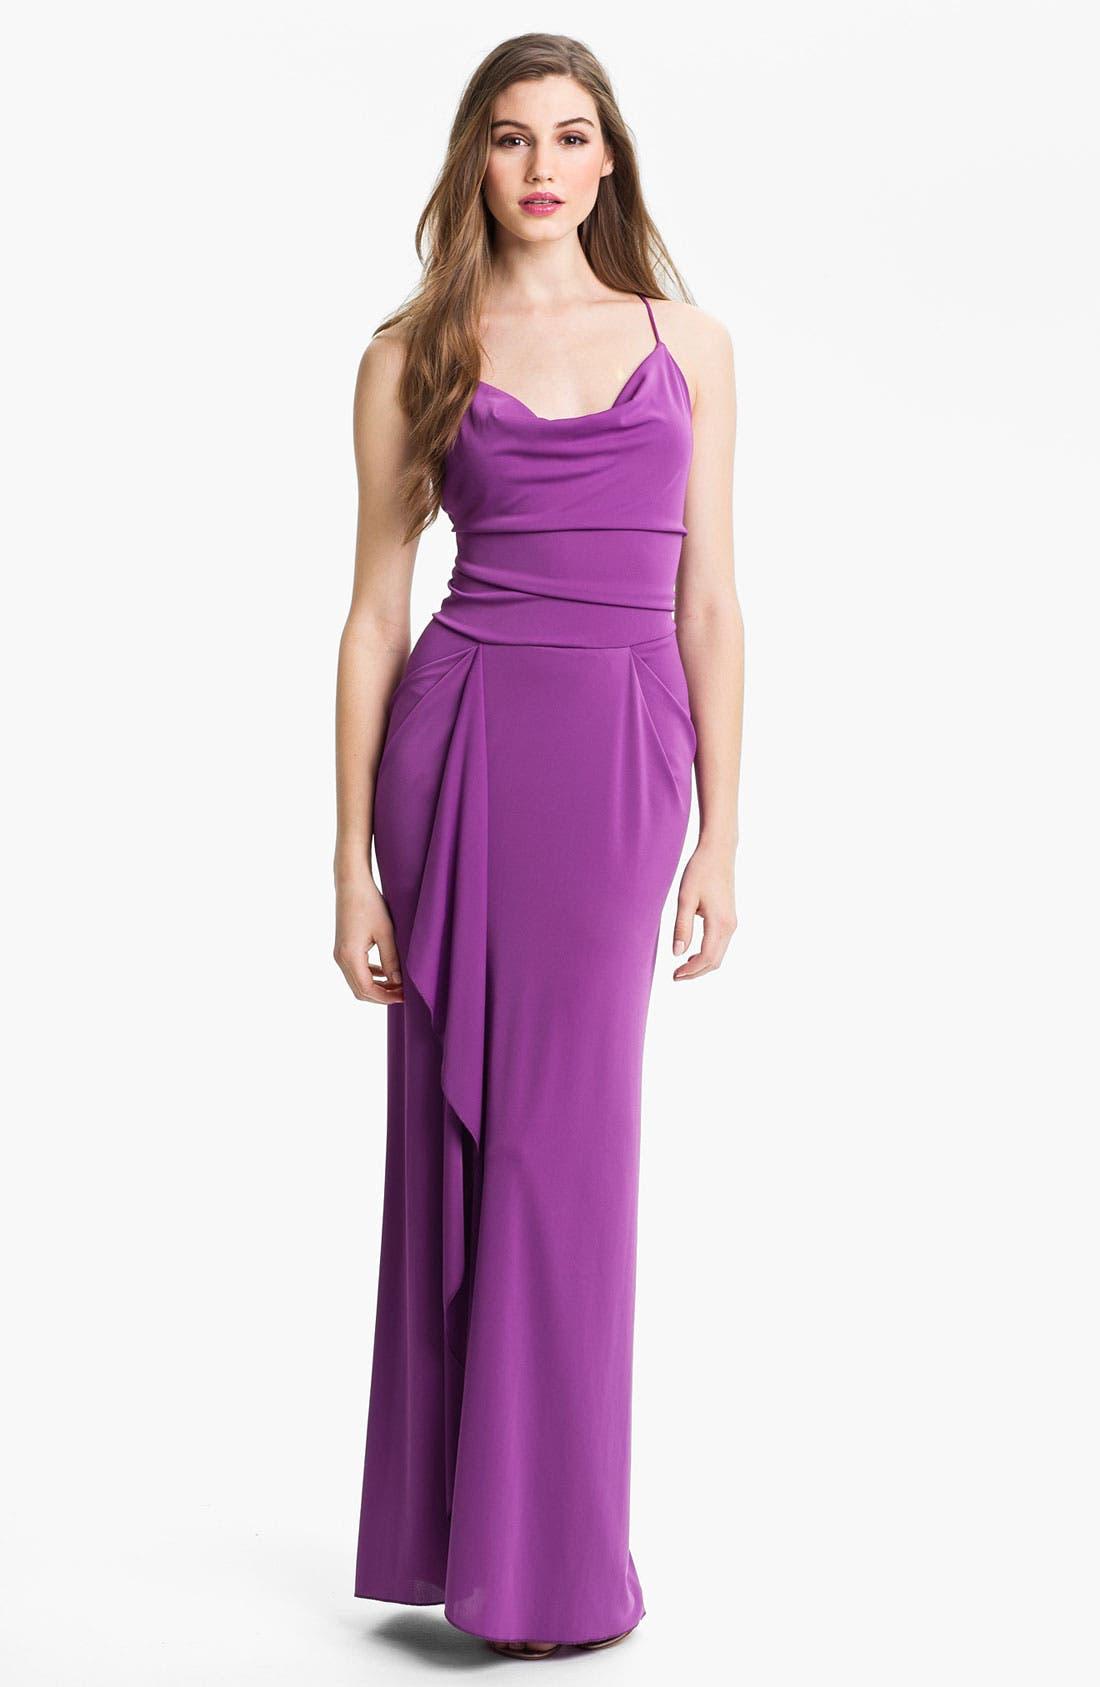 Main Image - BCBGMAXAZRIA Crisscross Back Jersey Gown